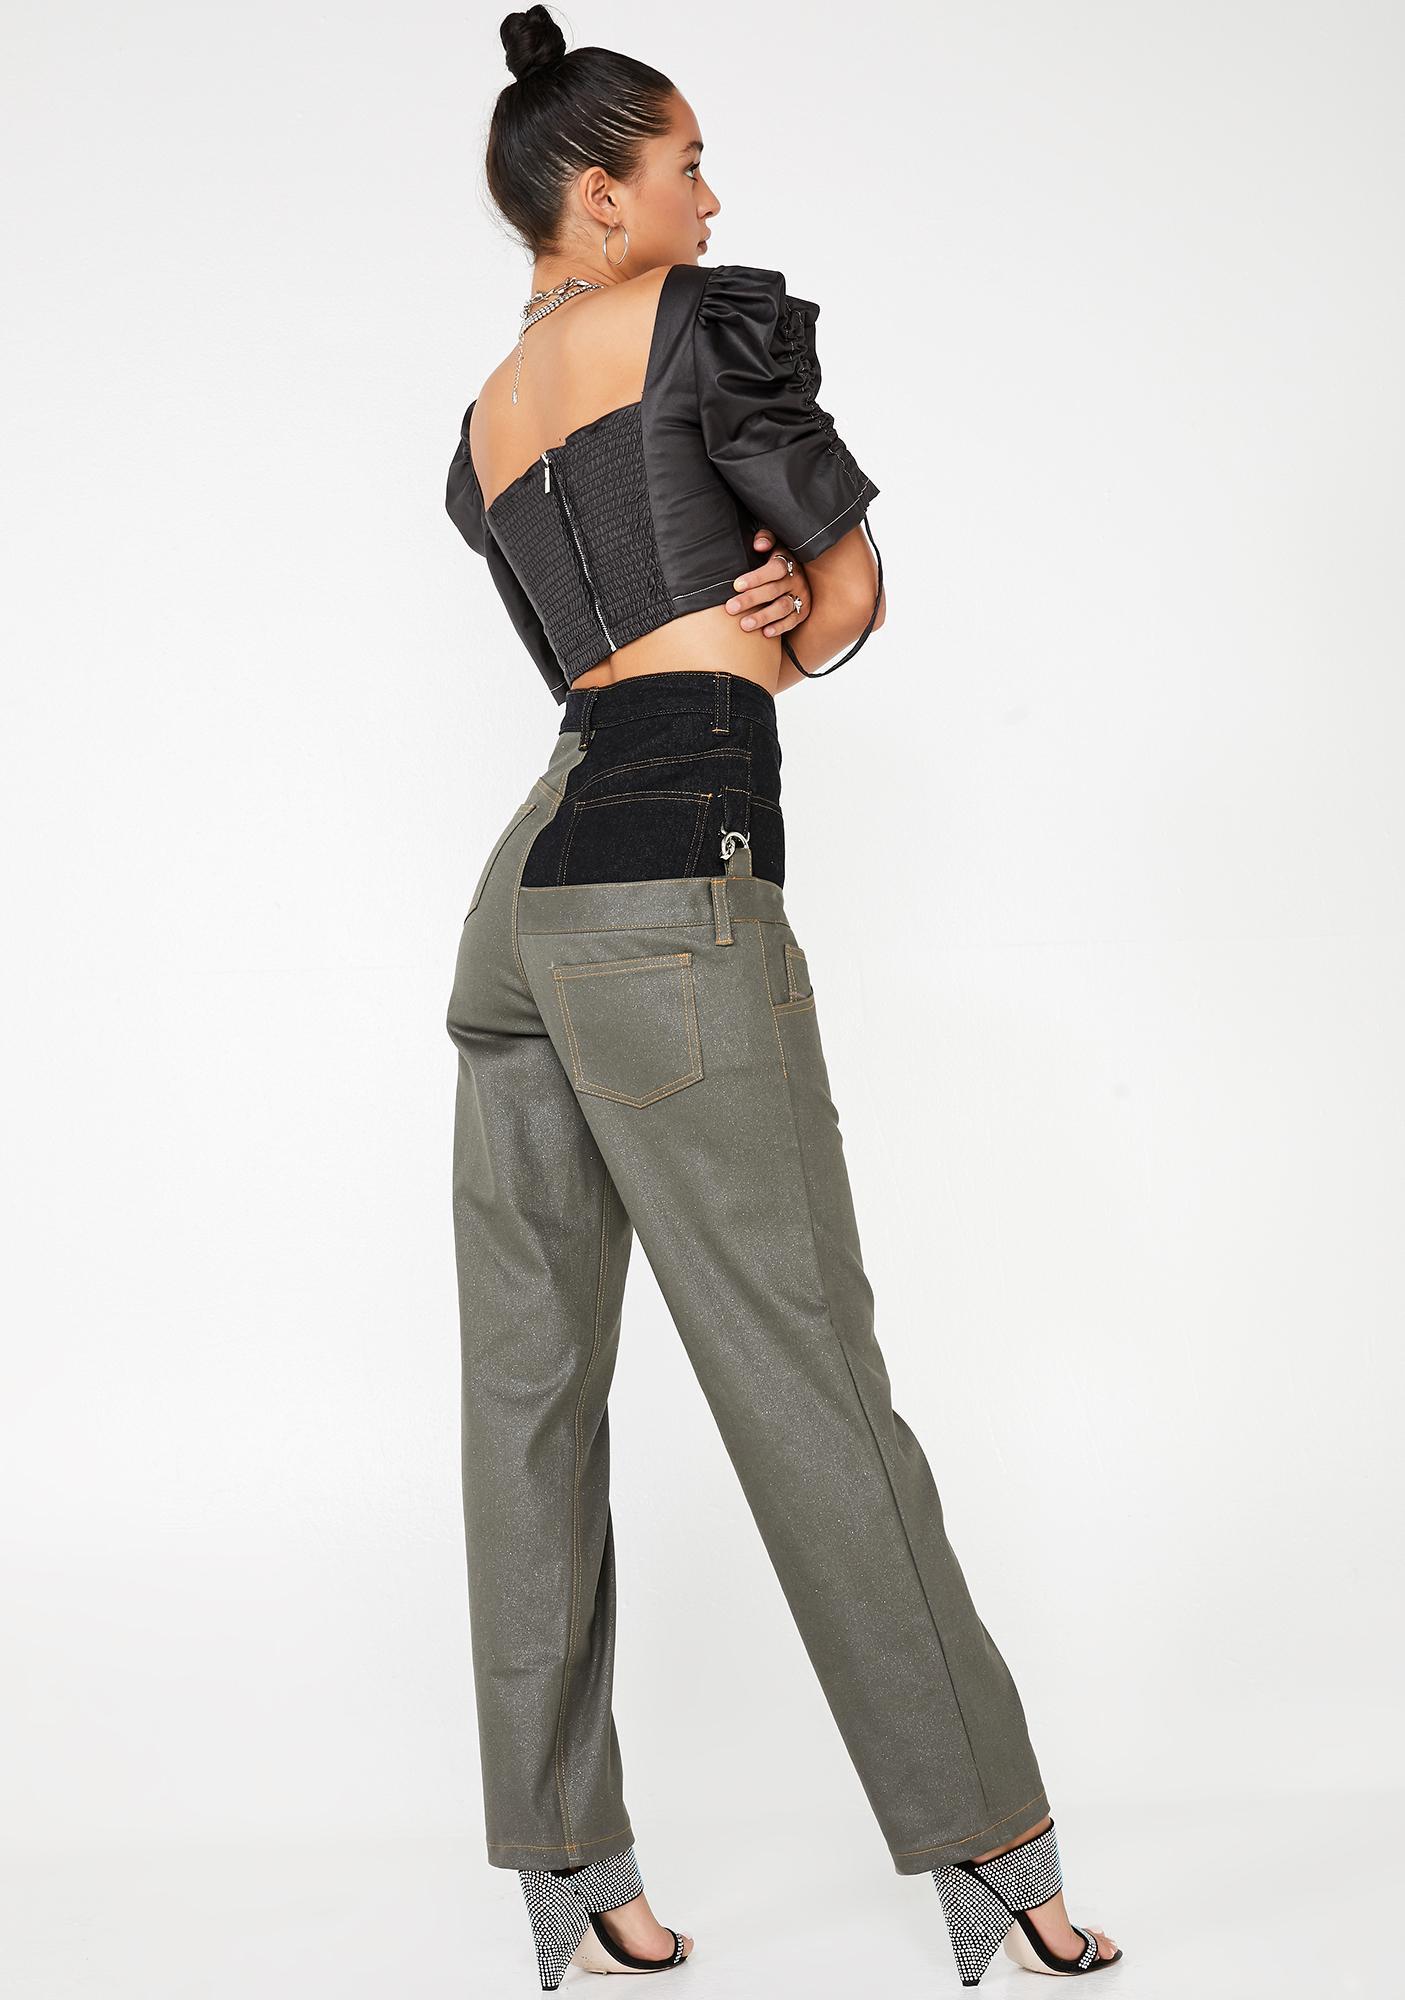 Stuck on Stupid Glitter Jeans